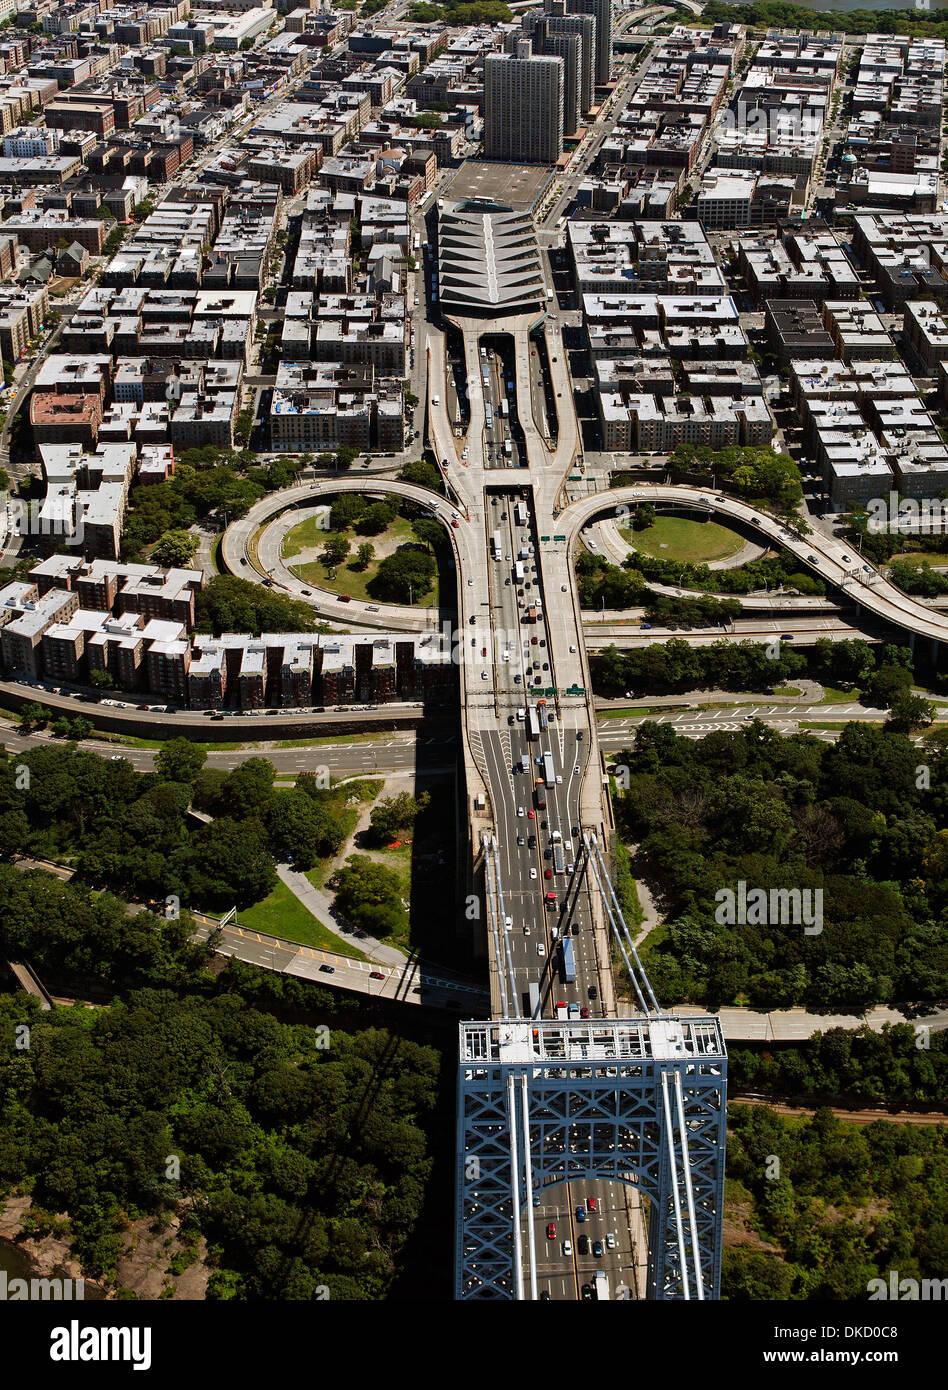 aerial photograph George Washington Bridge, Manhattan, New York City - Stock Image